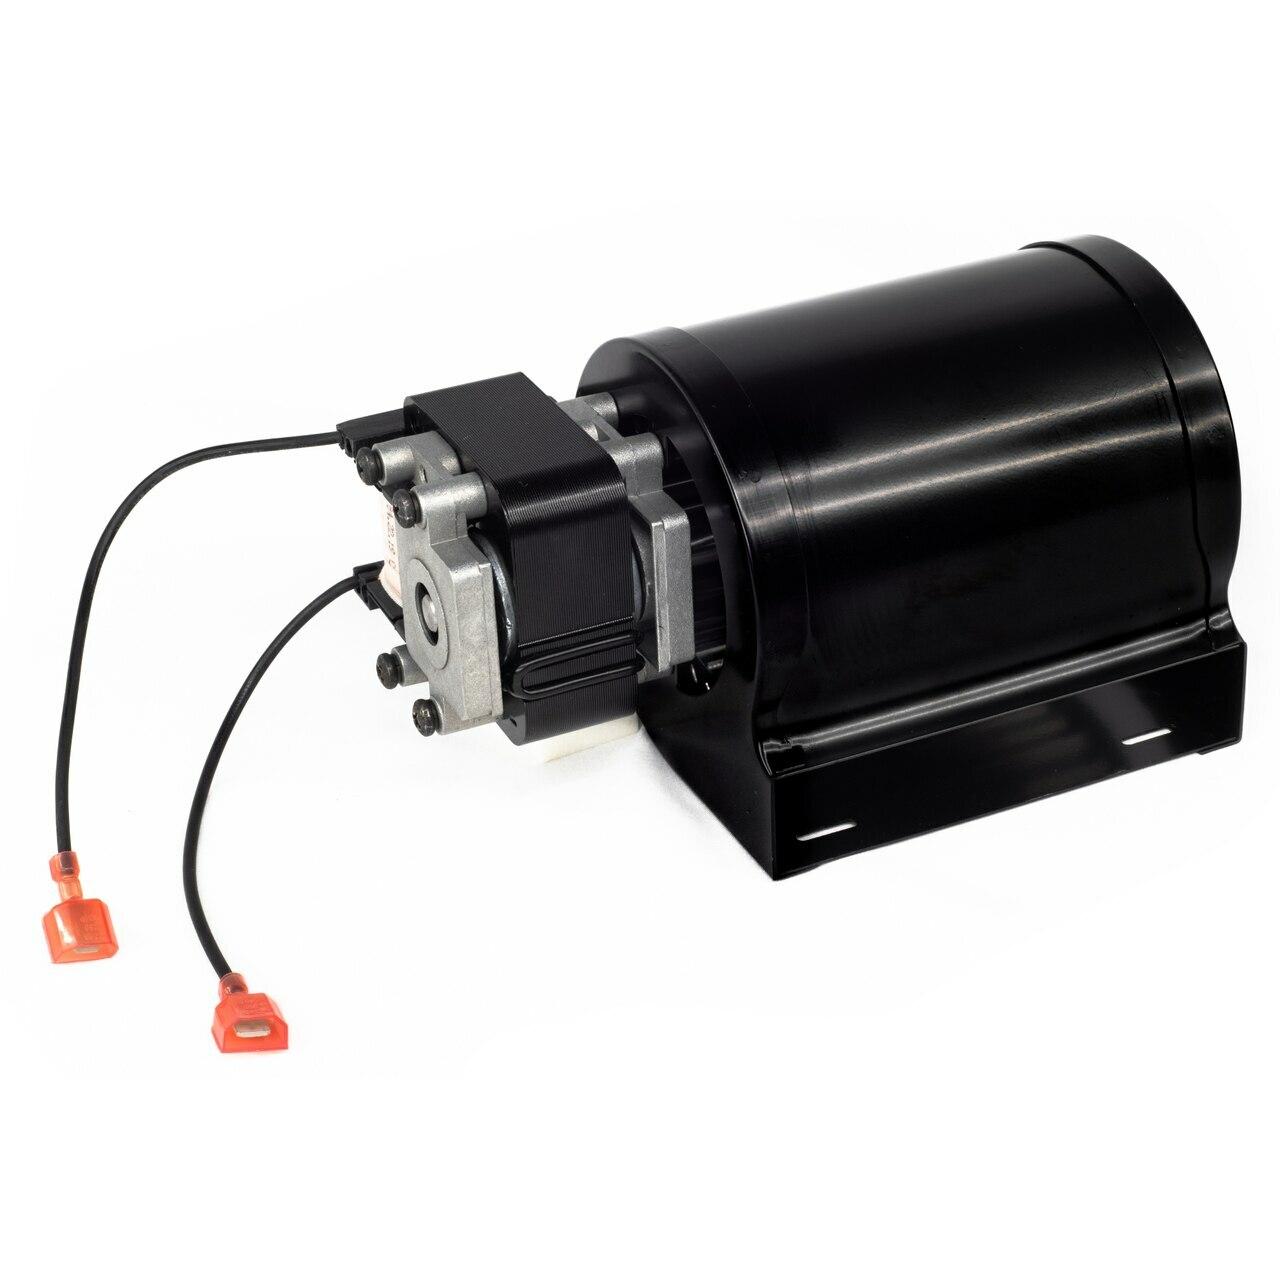 Buck Stove MA-ZCBB714 Blower Fan Kit Assembly for ZCBB Models